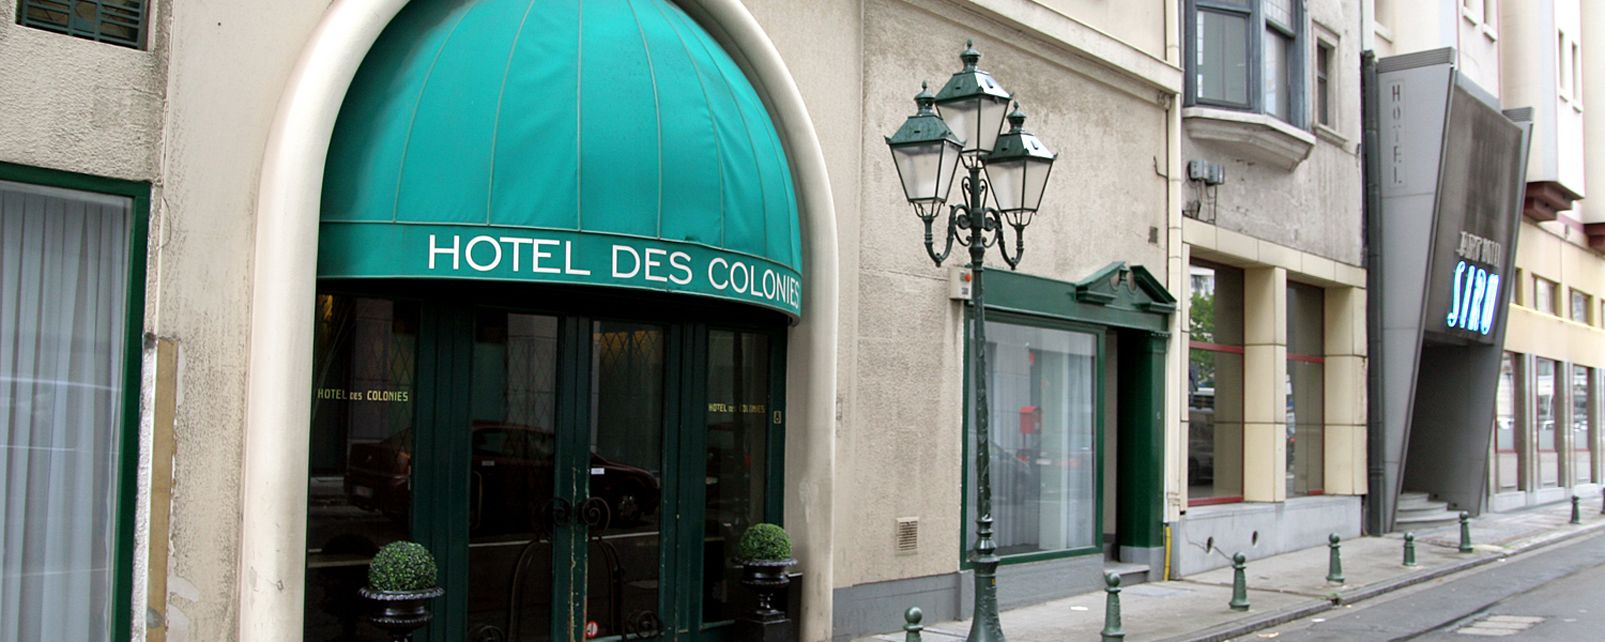 Hotel des Colonies meeting rooms